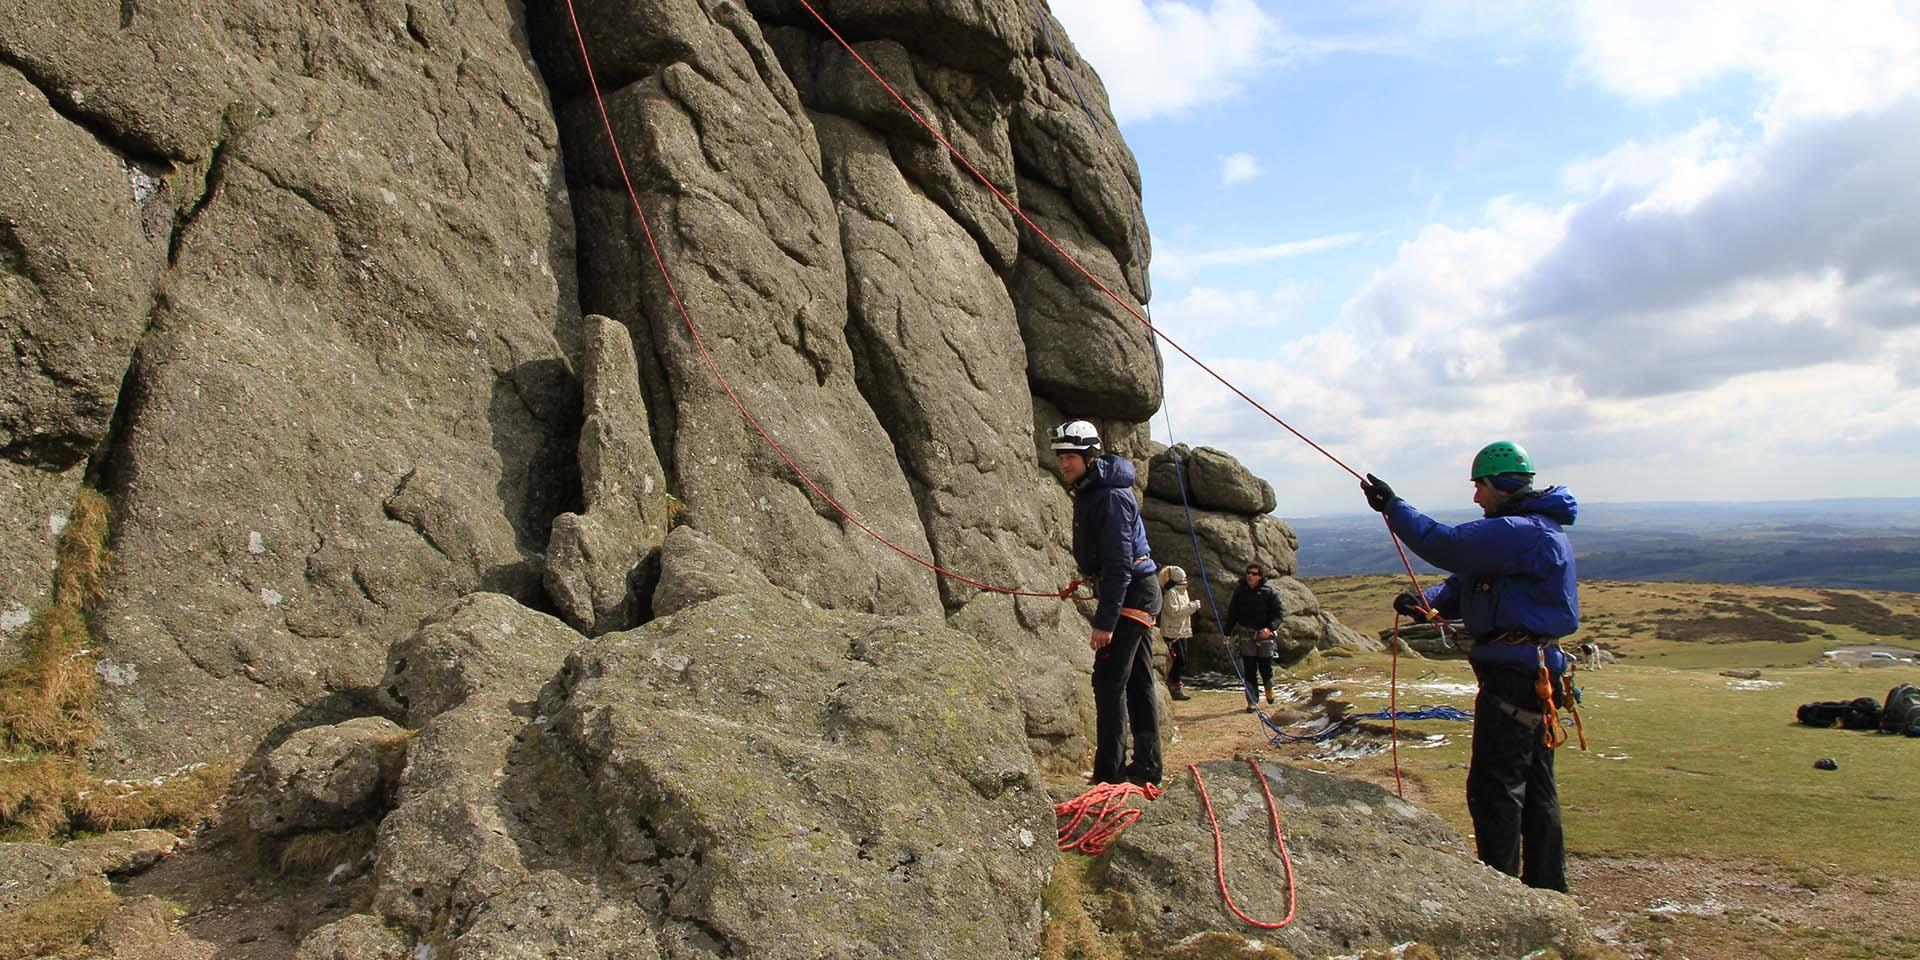 Climbers on Haytor Rock